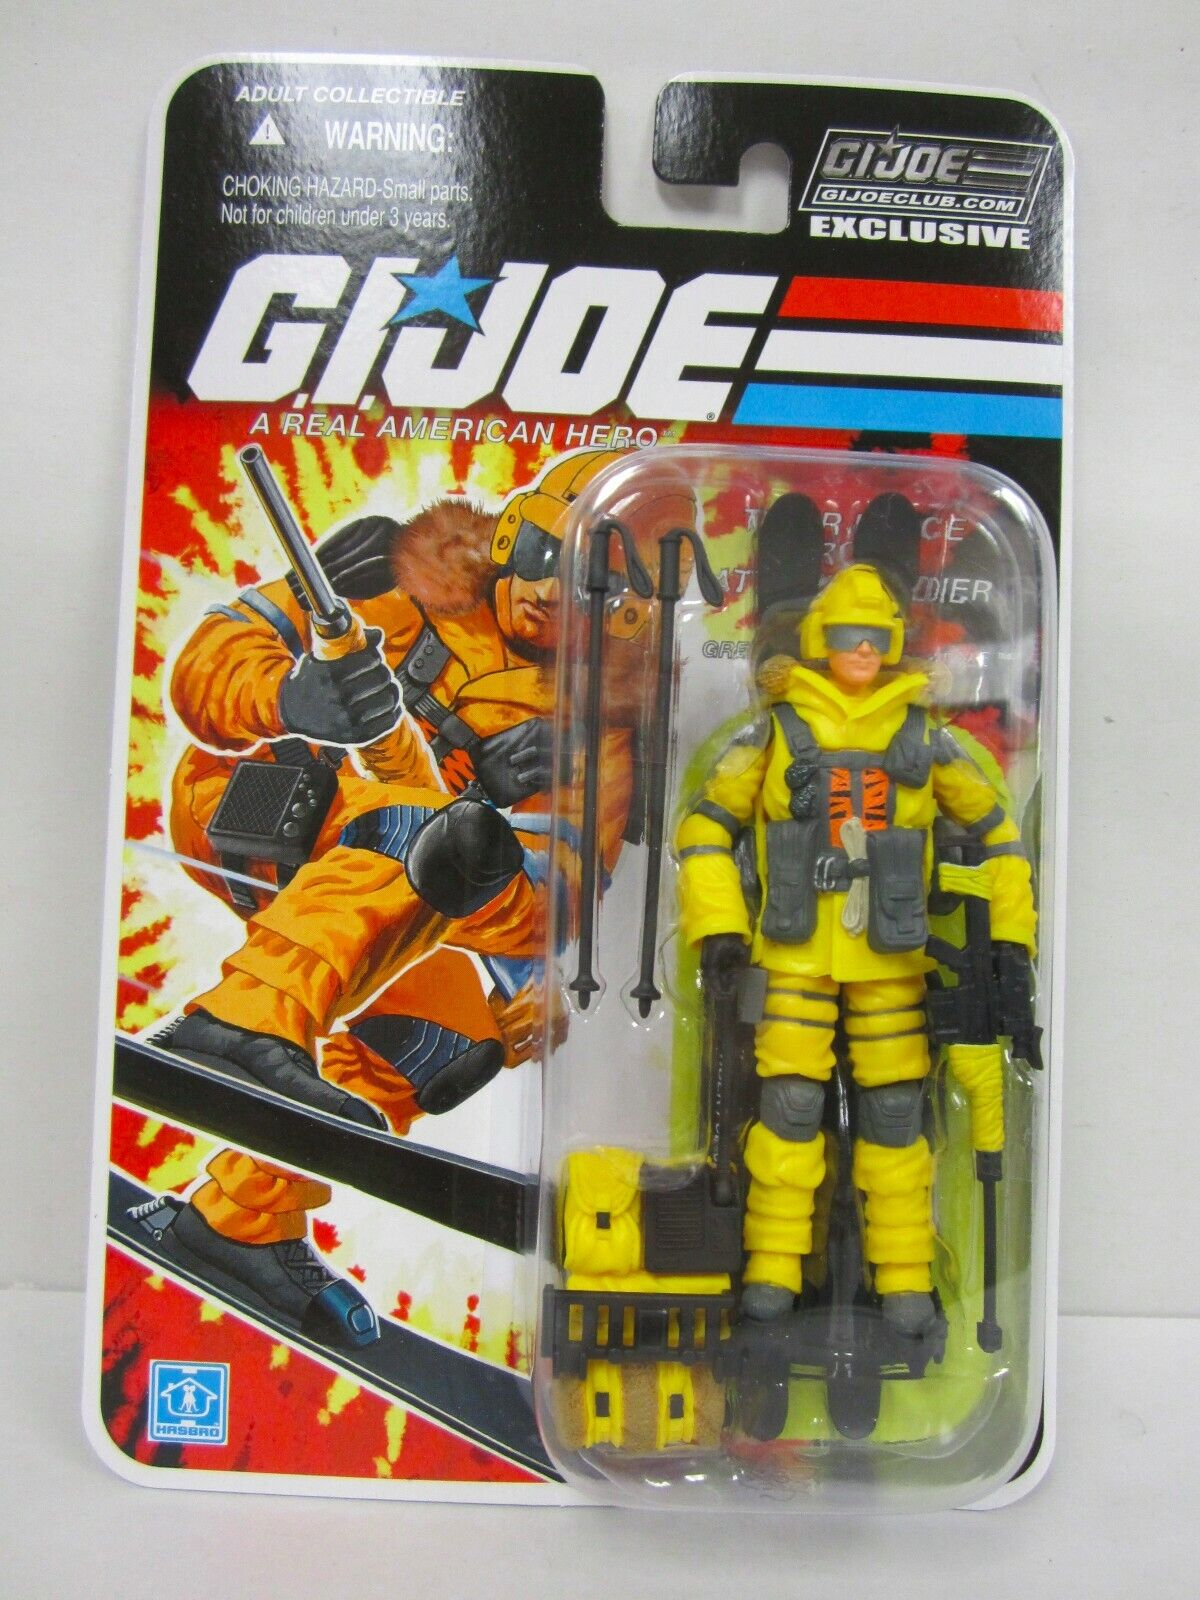 G.I. Joe Collector's Club FSS final 12 Tiger Force Reino Unido Blizzard acción figura menta en tarjeta